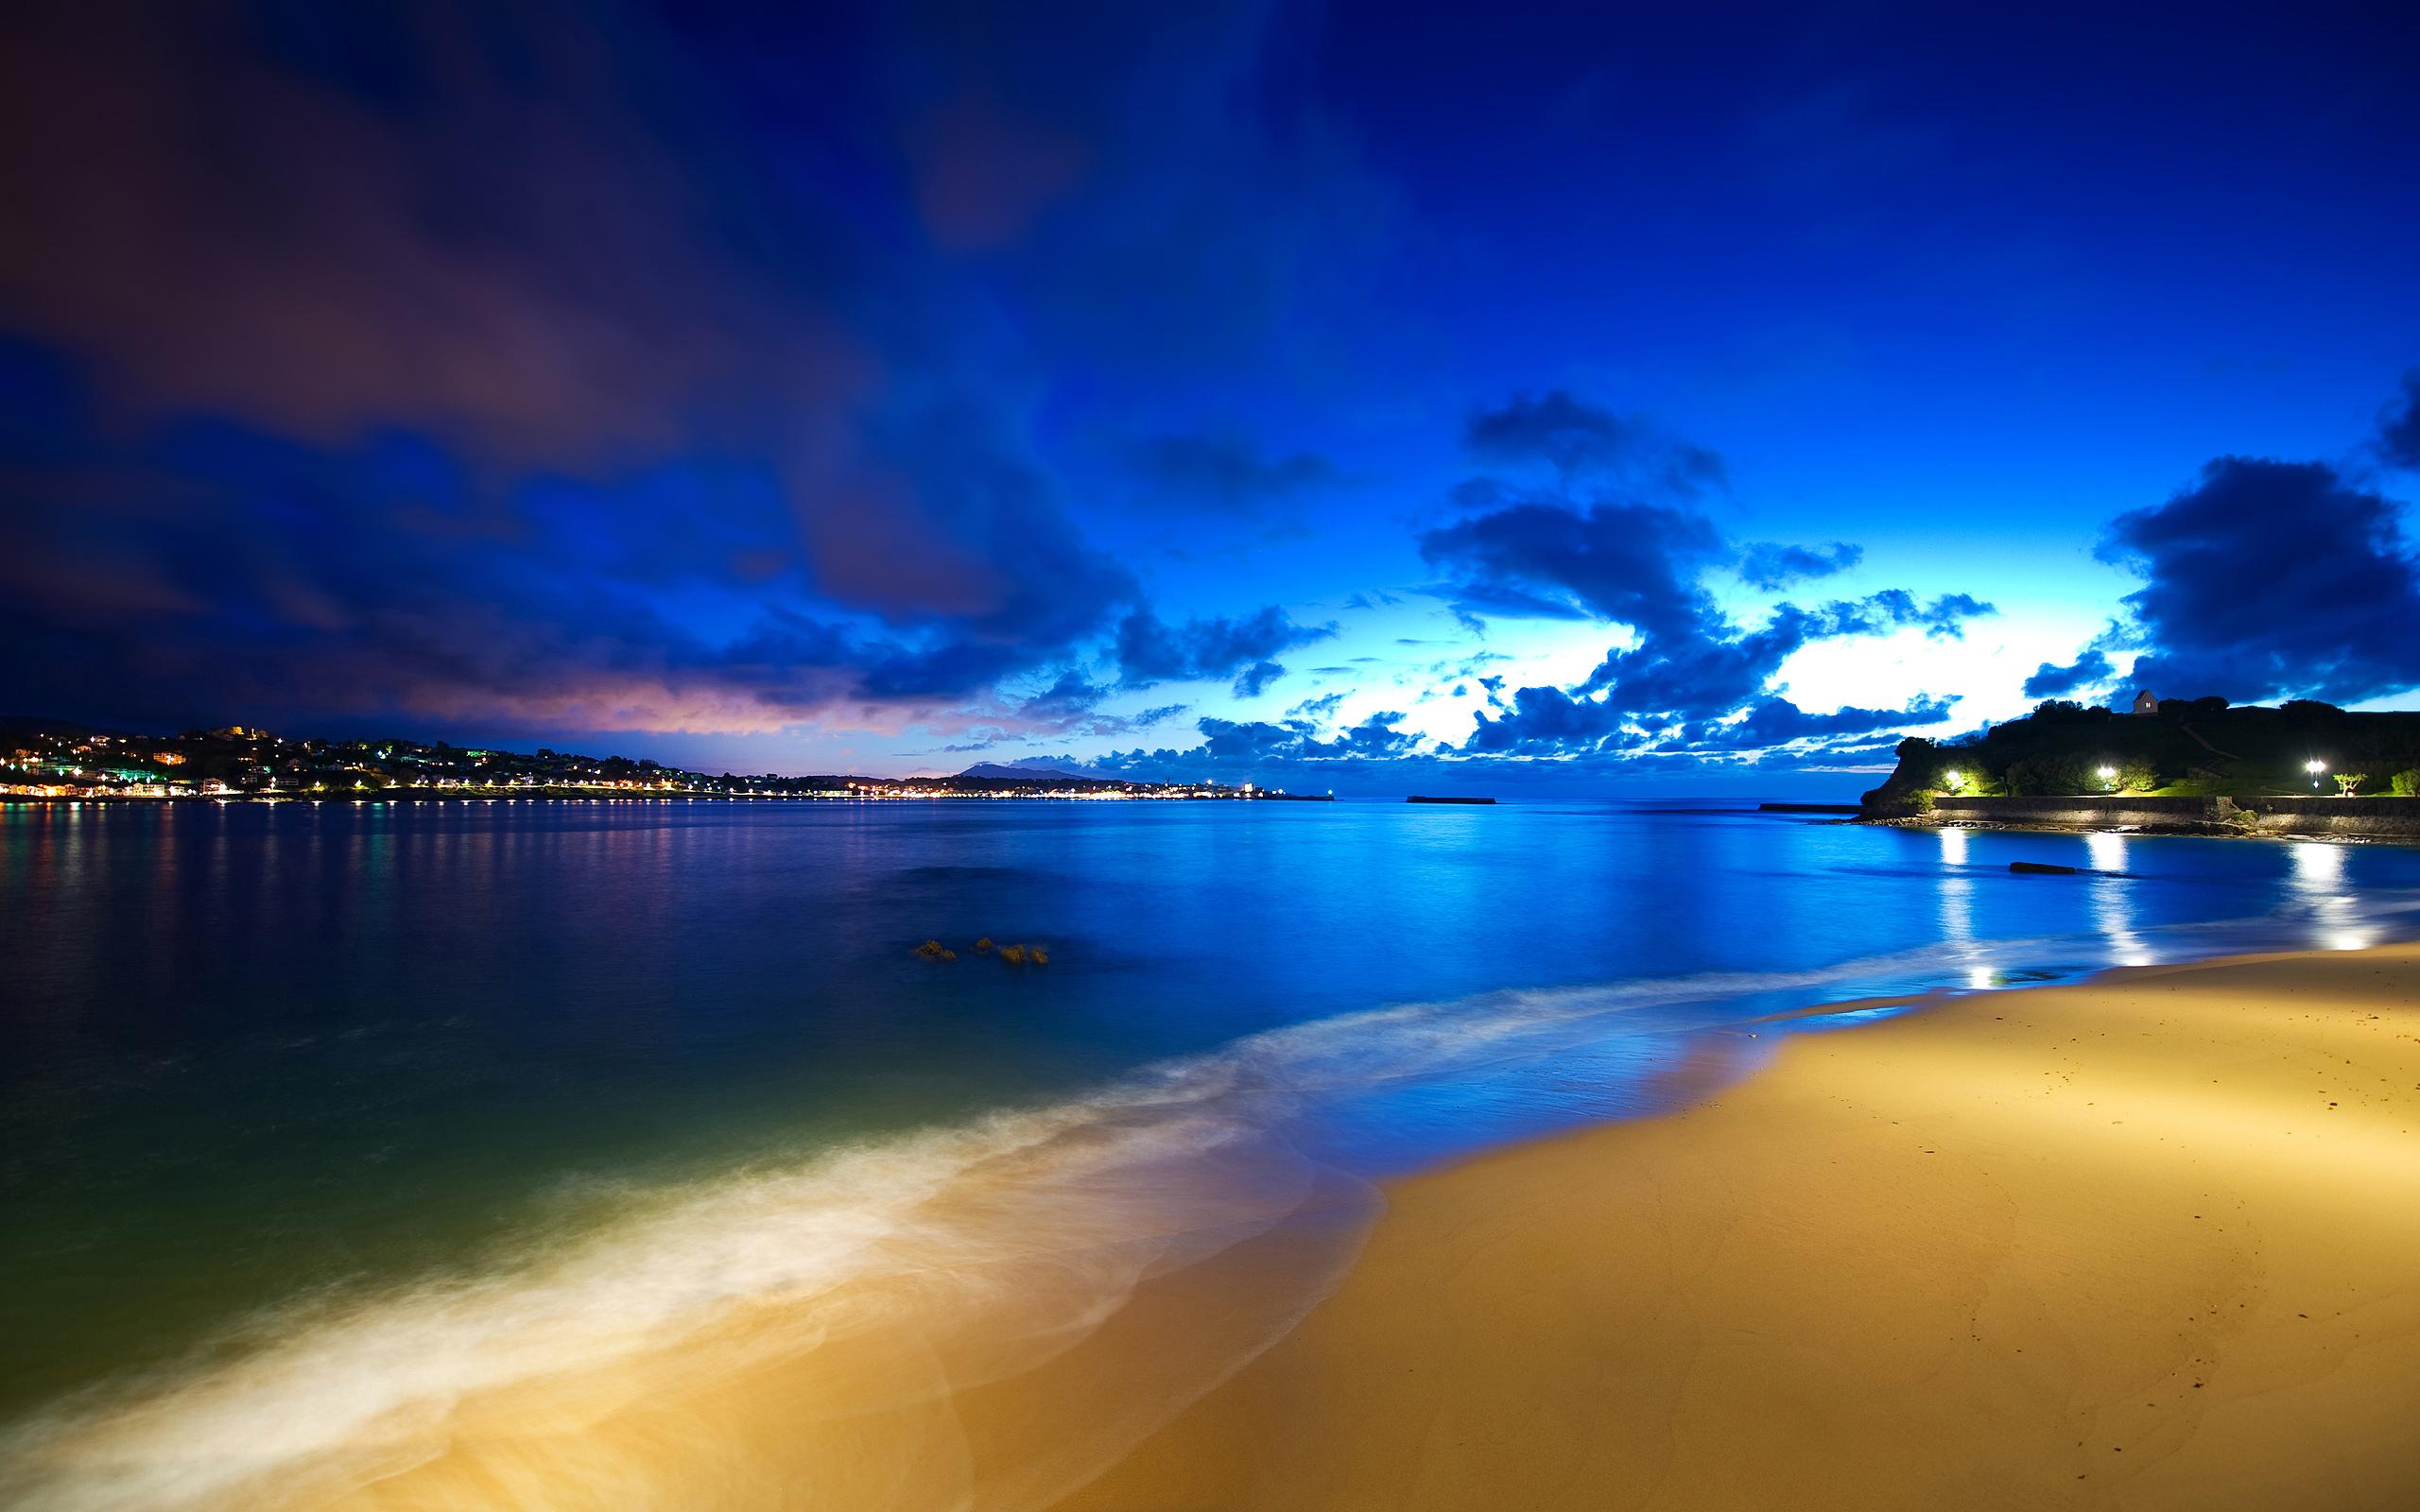 Ocean Beach At Night HD Wallpaper 2560x1600